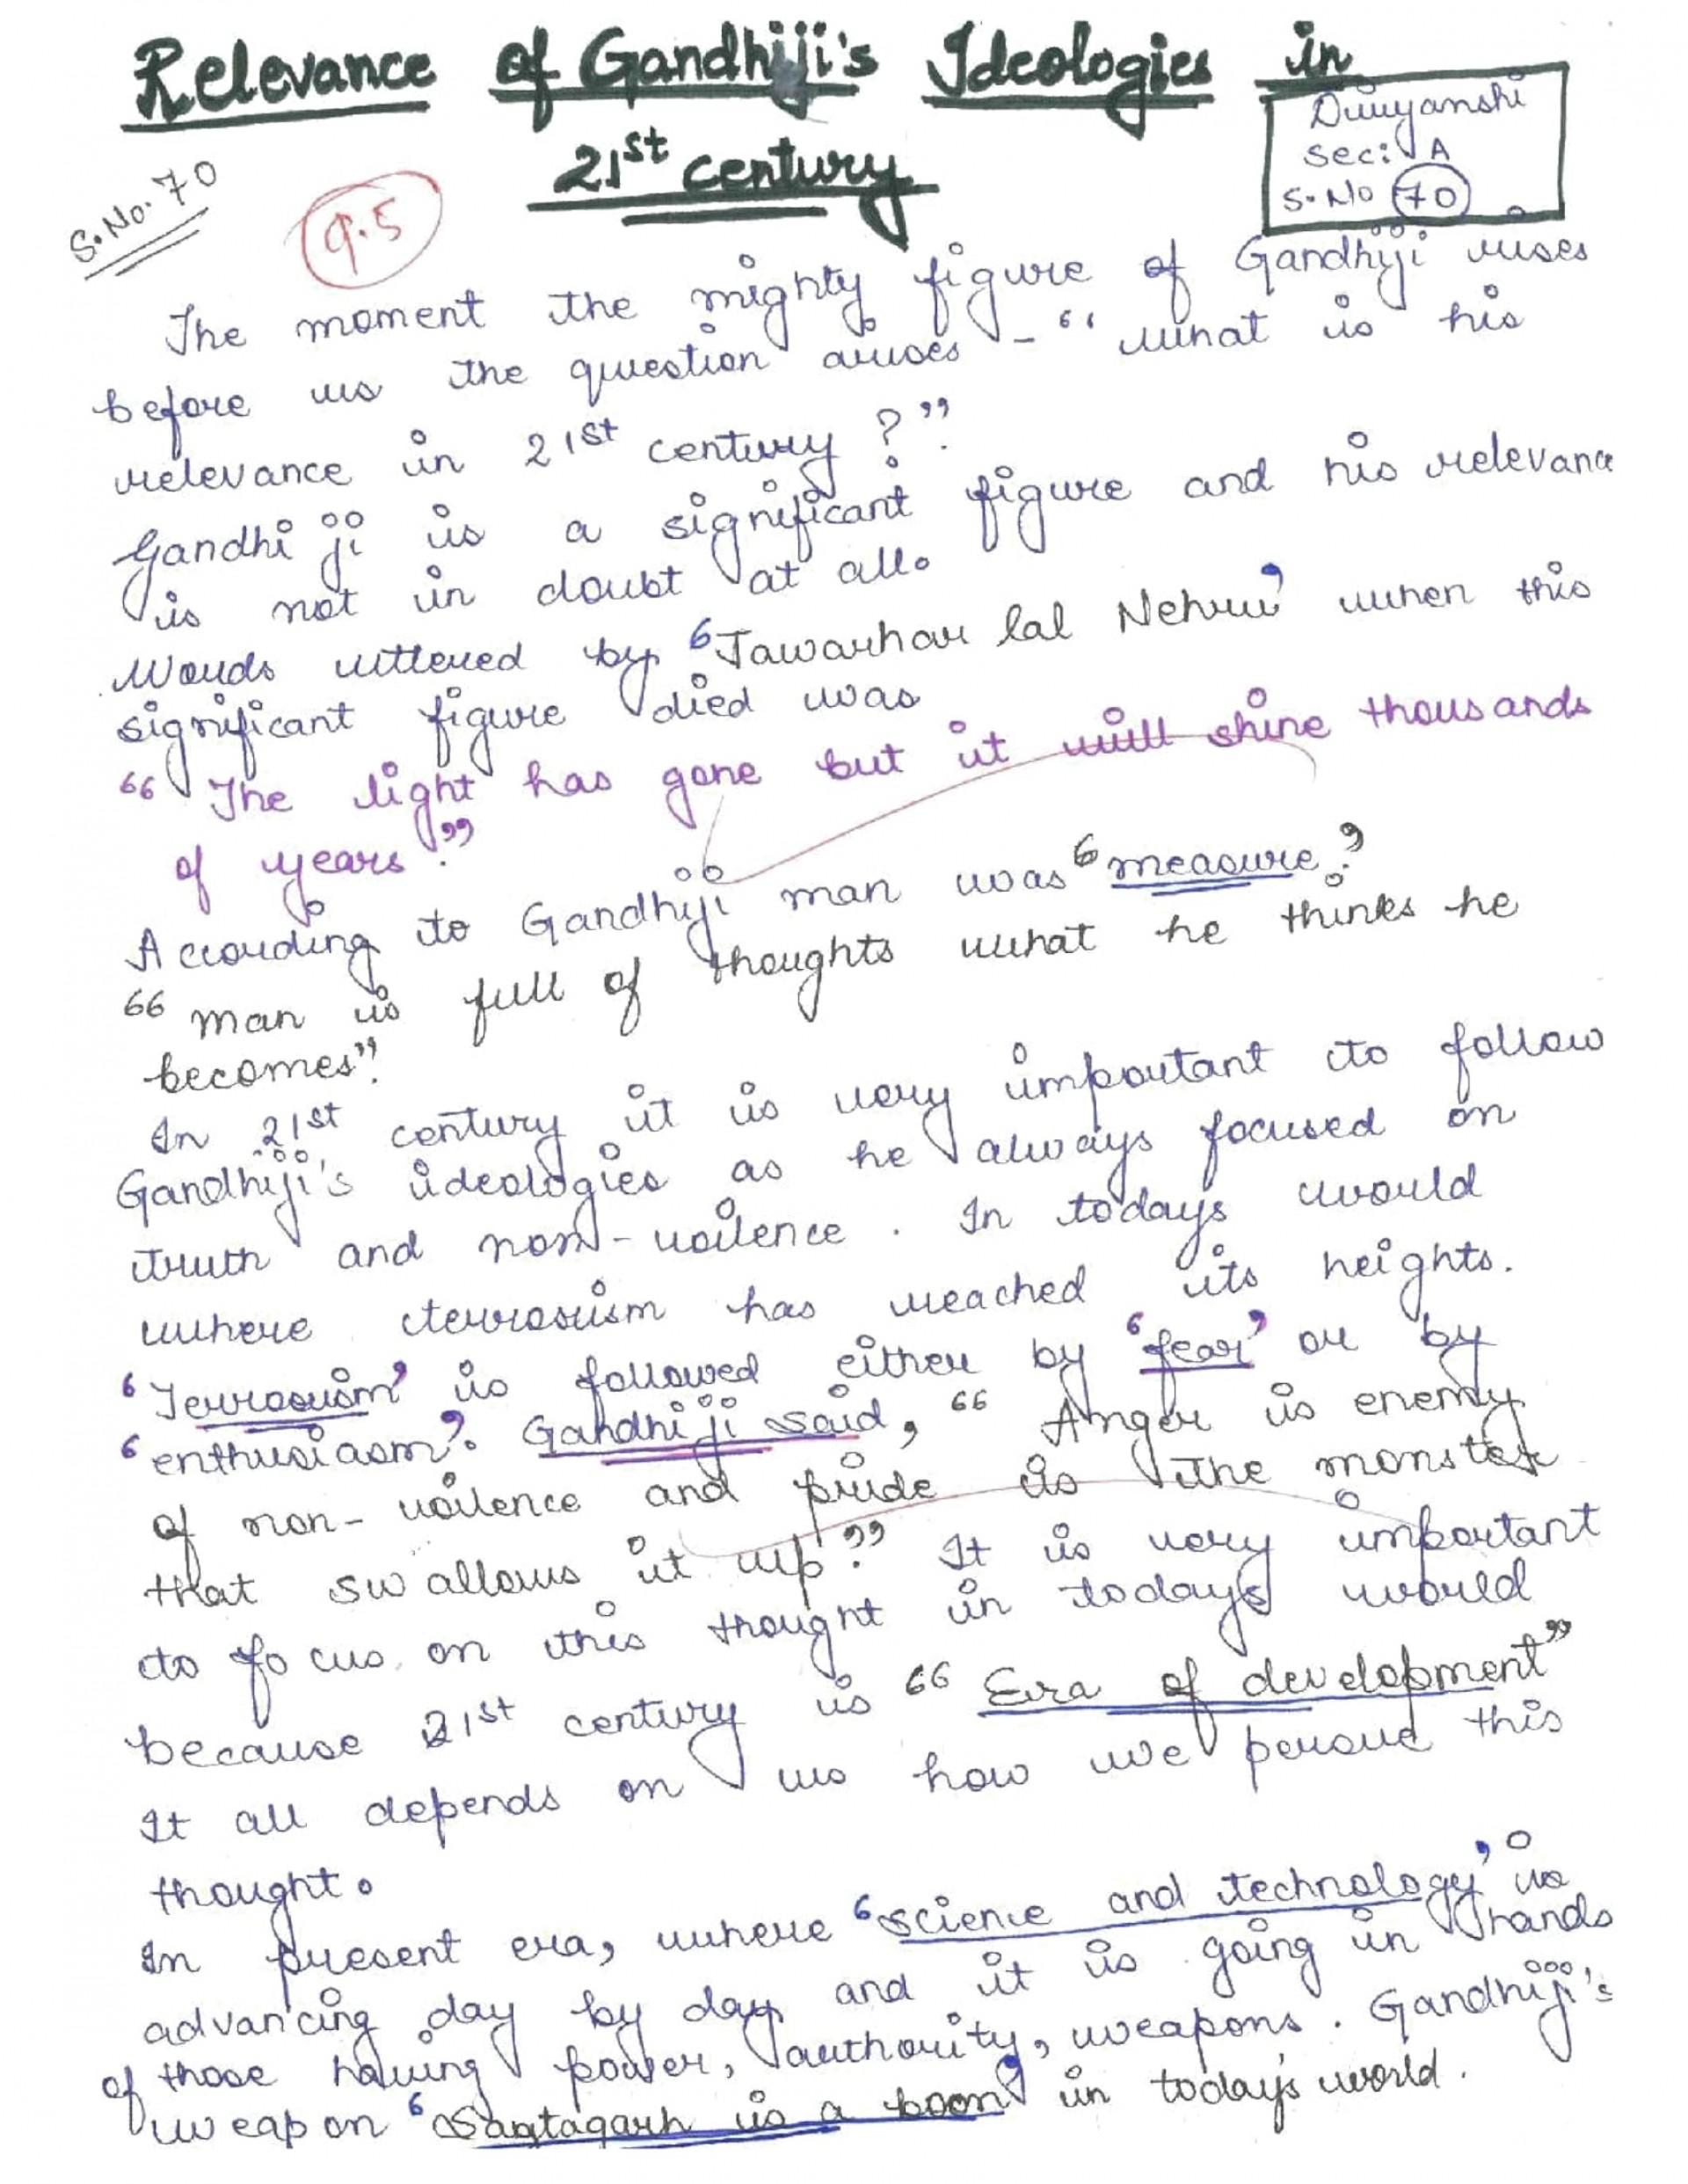 007 Gandhiji Essay Essay1 Sensational Mahatma Gandhi In Gujarati Pdf Free Download Hindi Language Ma Nibandh 1920